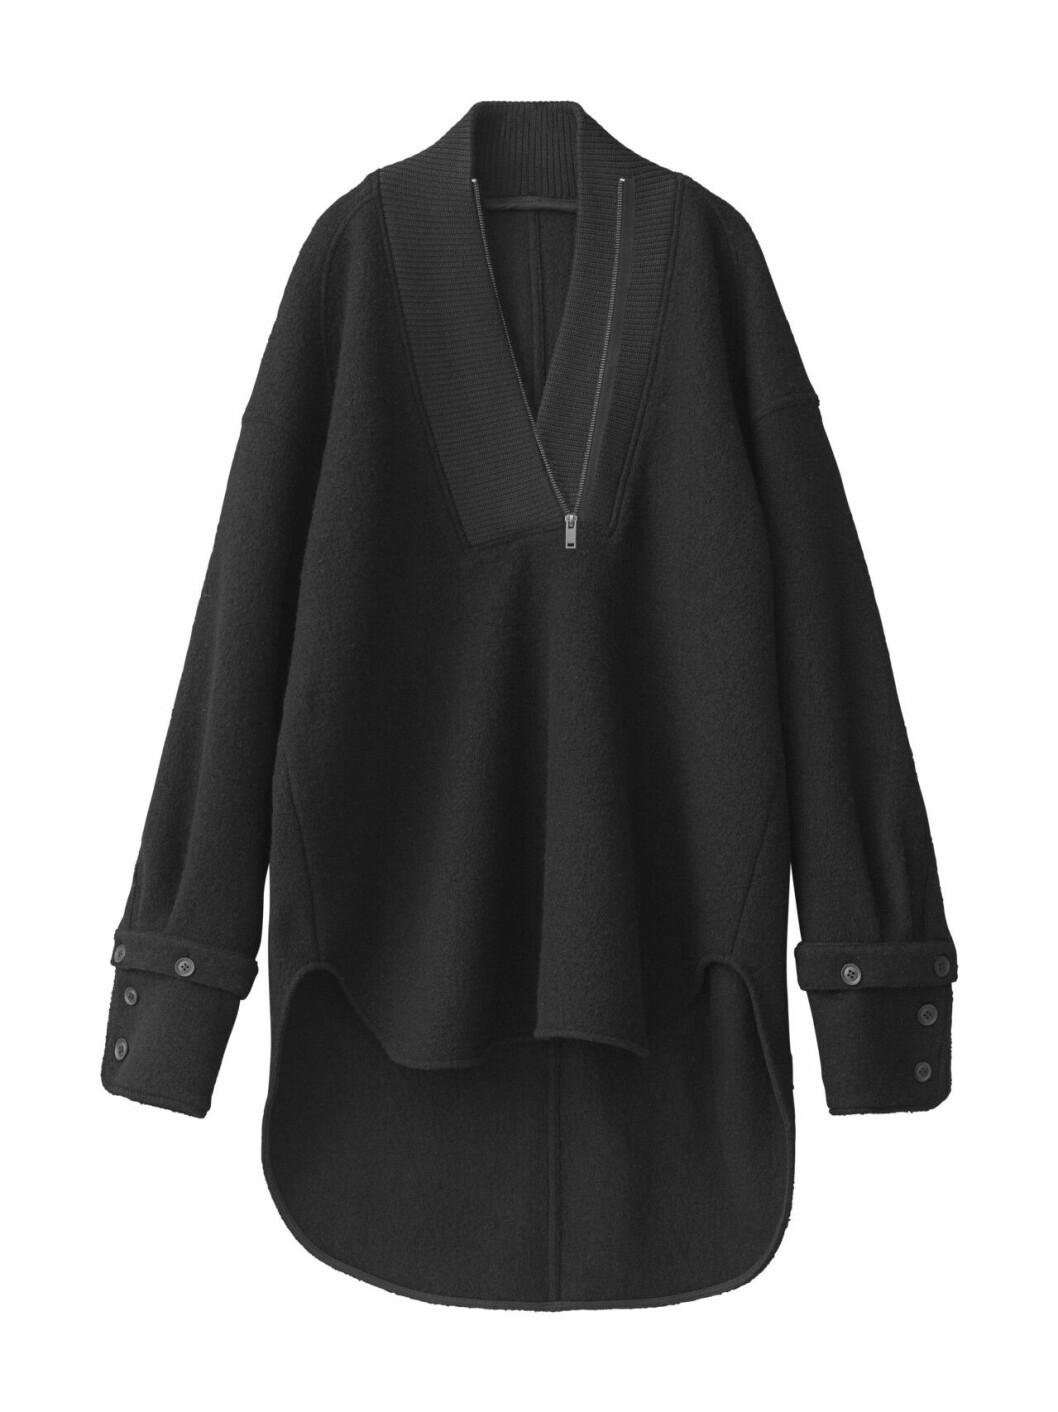 H&M Studio höstkollektion aw 2019 – svart stickad tröja